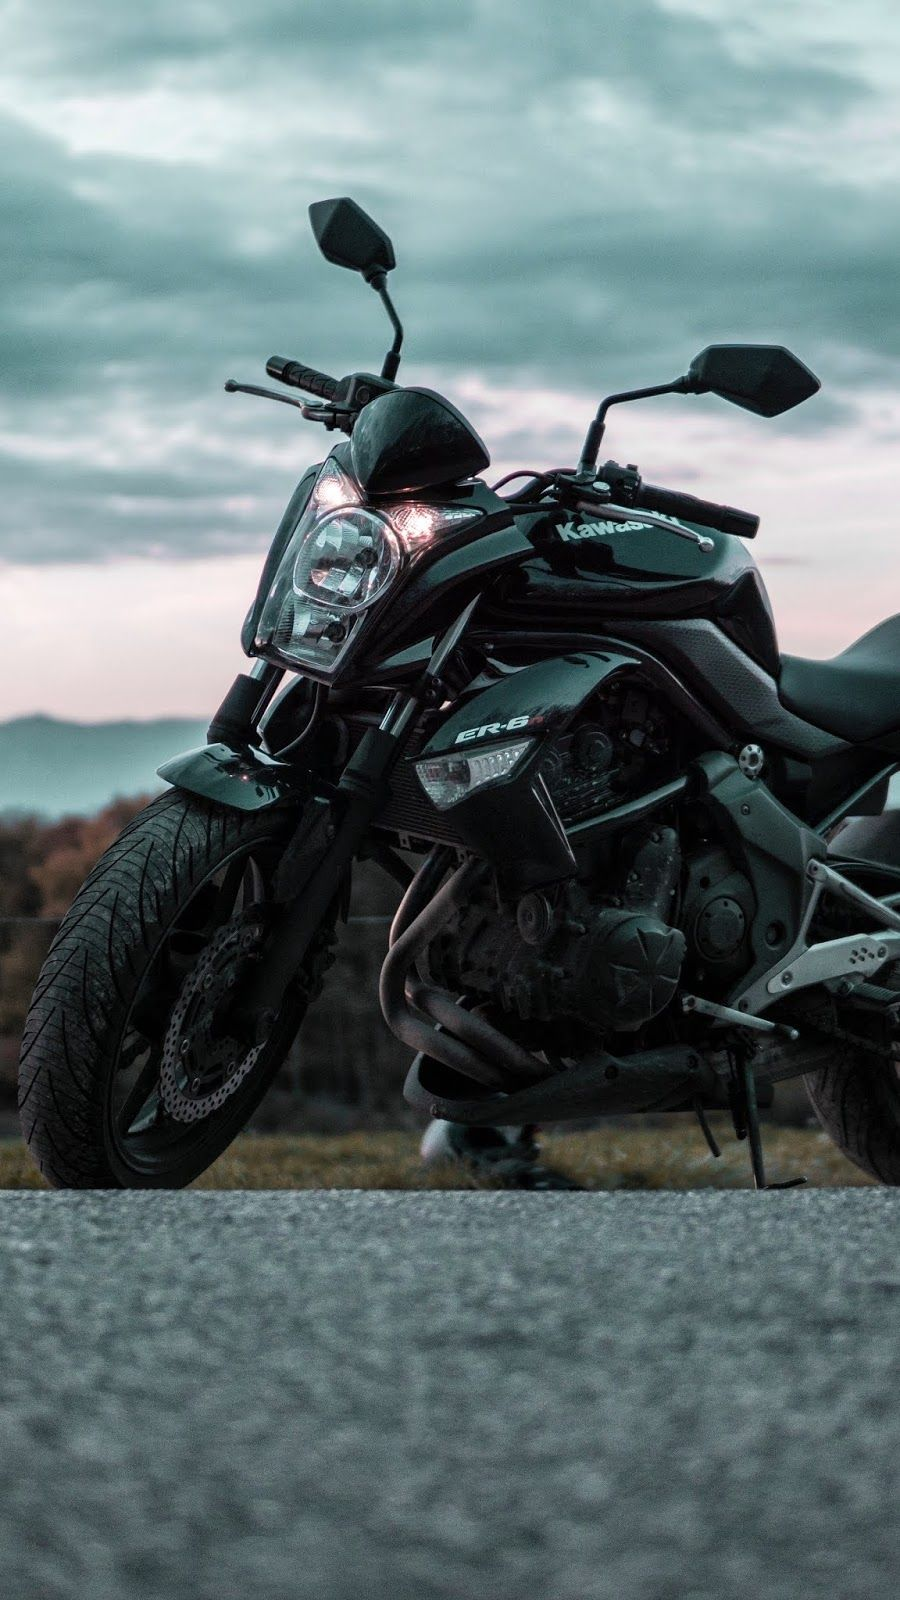 Motorcycle Side View Road Motorcycle Wallpaper Motorcycle Black Motorcycle